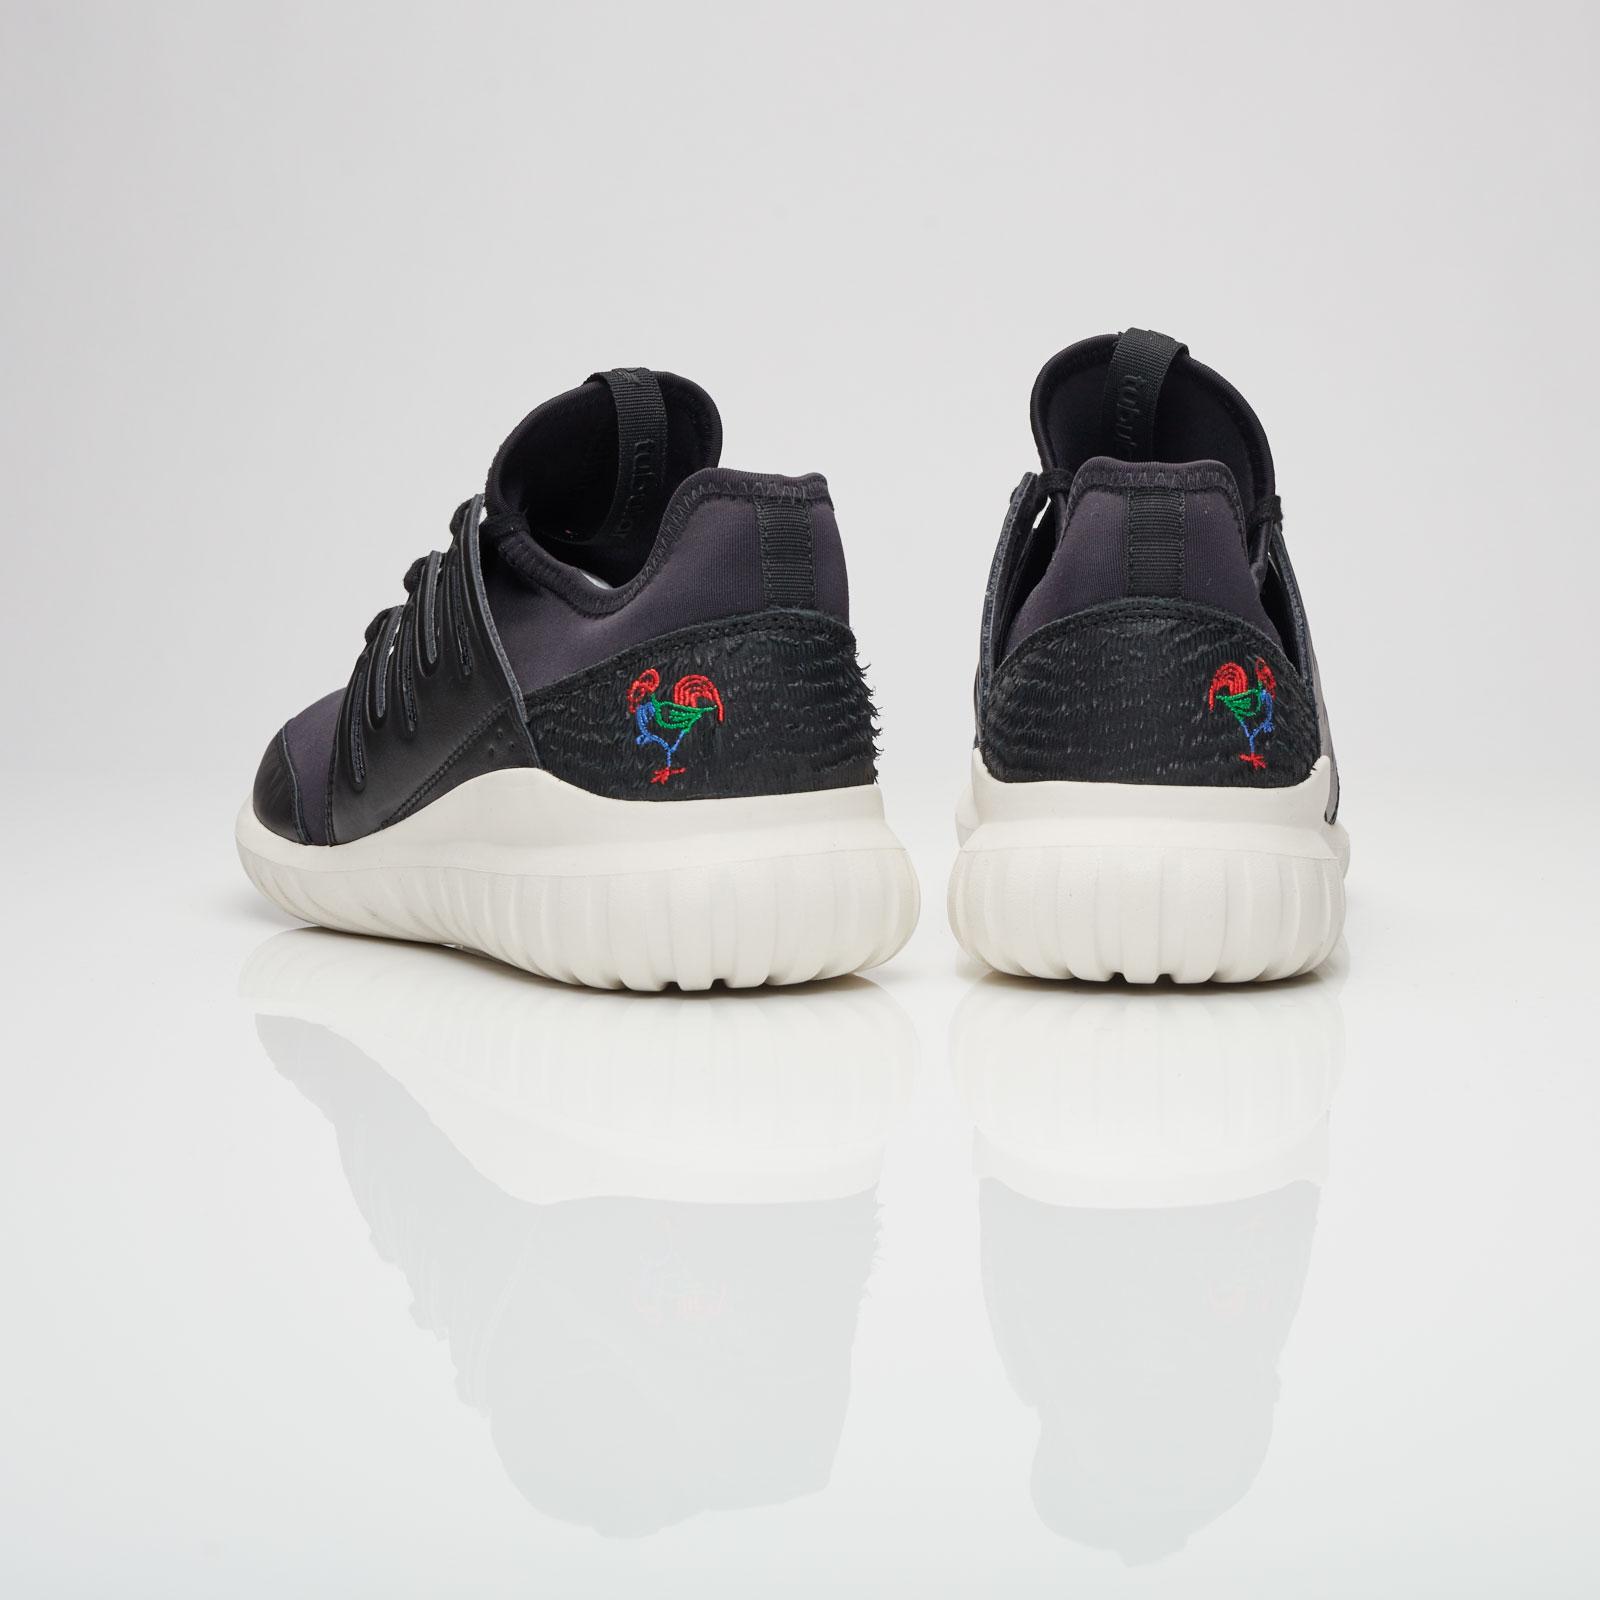 new arrival 6f5f3 bd272 adidas Tubular Radial Cny - Ba7780 - Sneakersnstuff | sneakers & streetwear  online since 1999